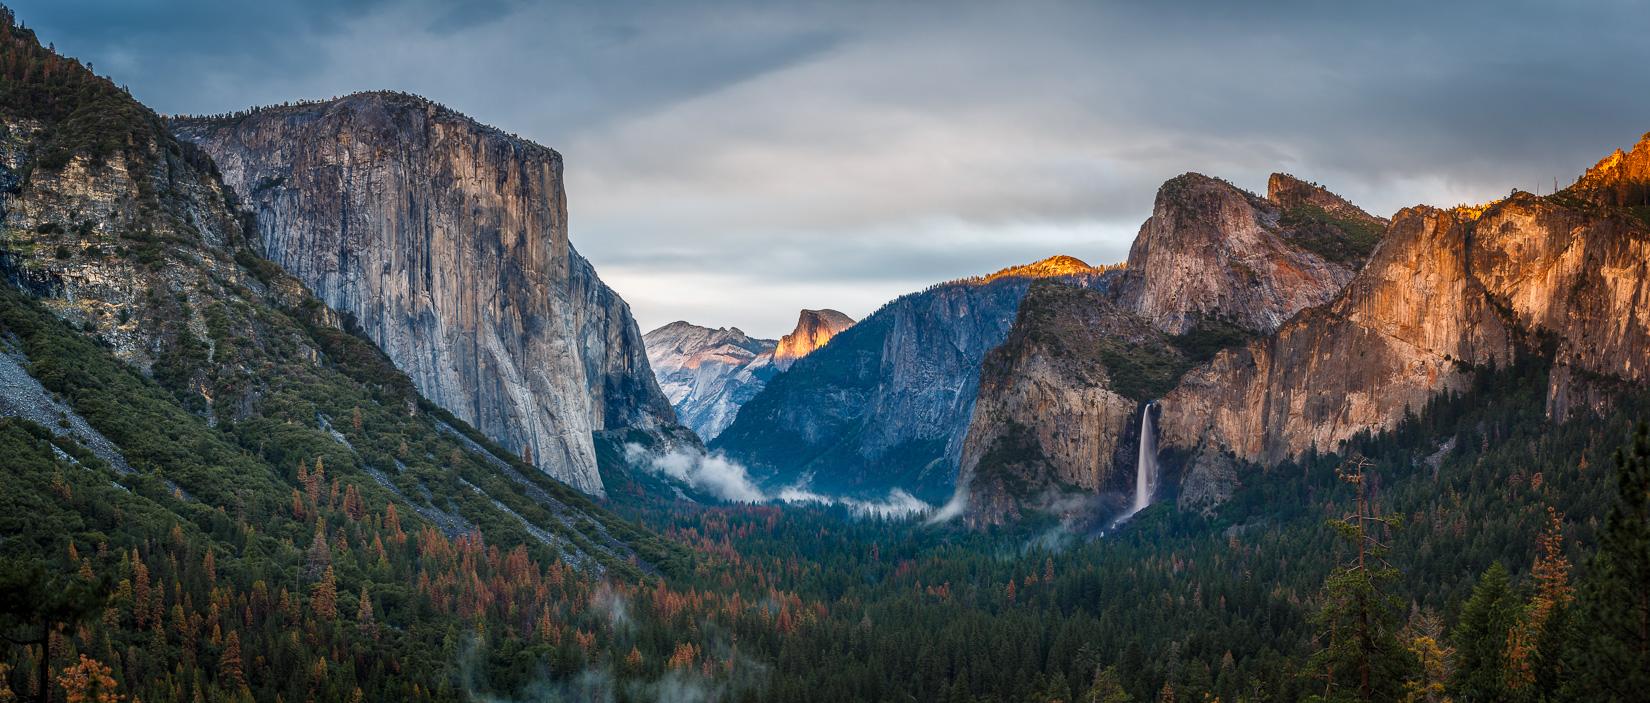 ~~ Tunnel View (Yosemite NP) ~~